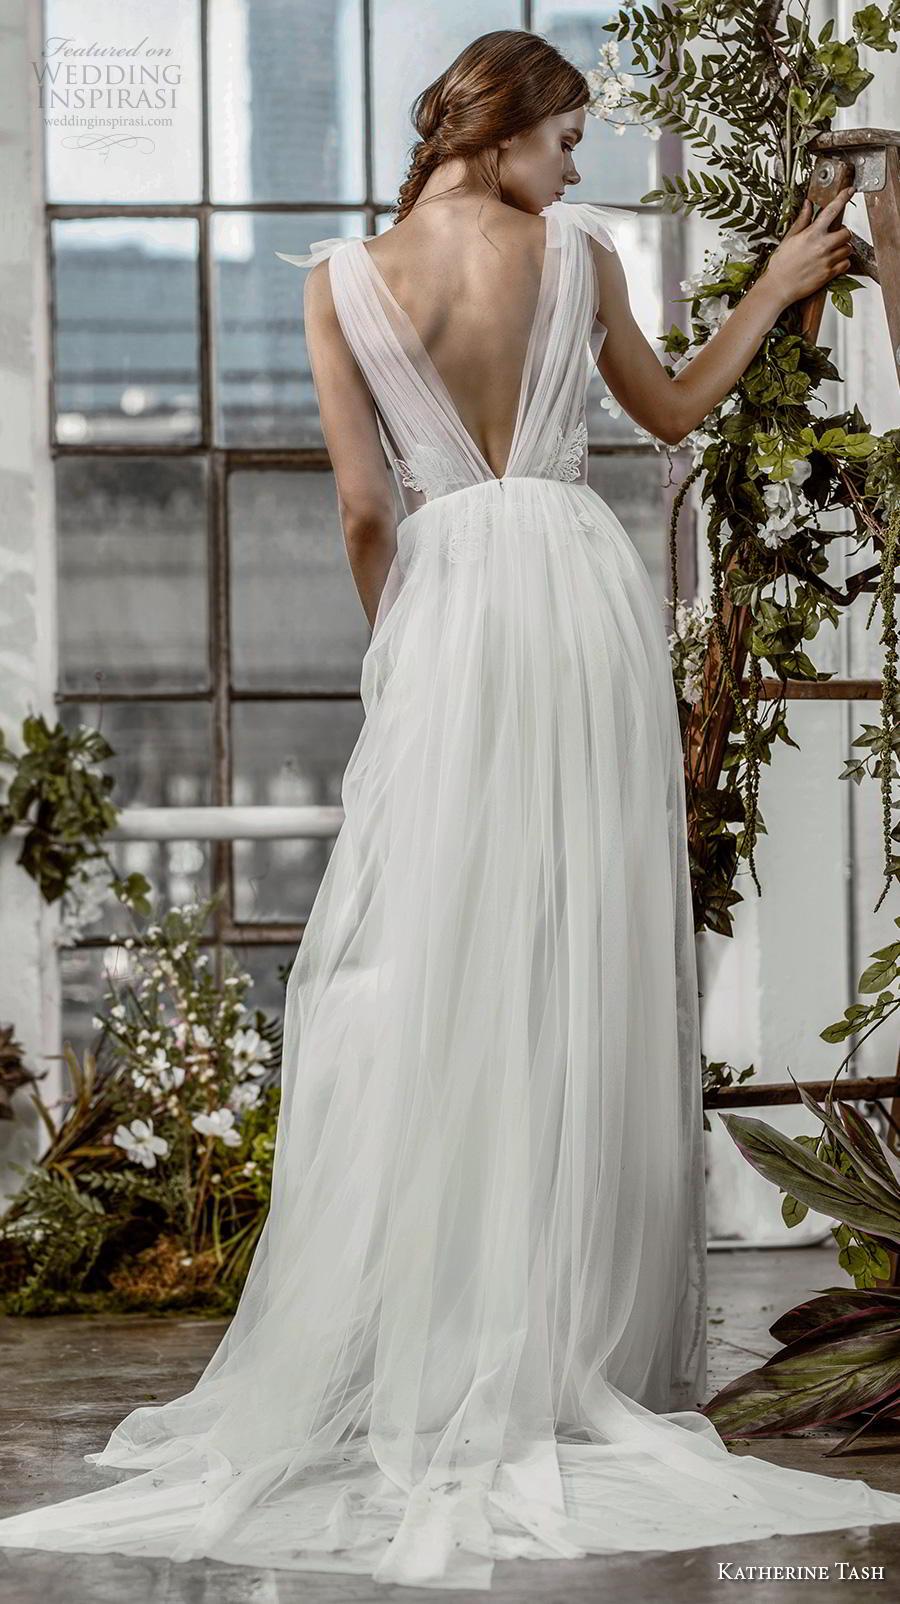 katherine tash fall 2019 bridal sleeveless illusion bateau v neck ruched embellished bodice romantic soft a  line wedding dress open v back chapel train (9) bv